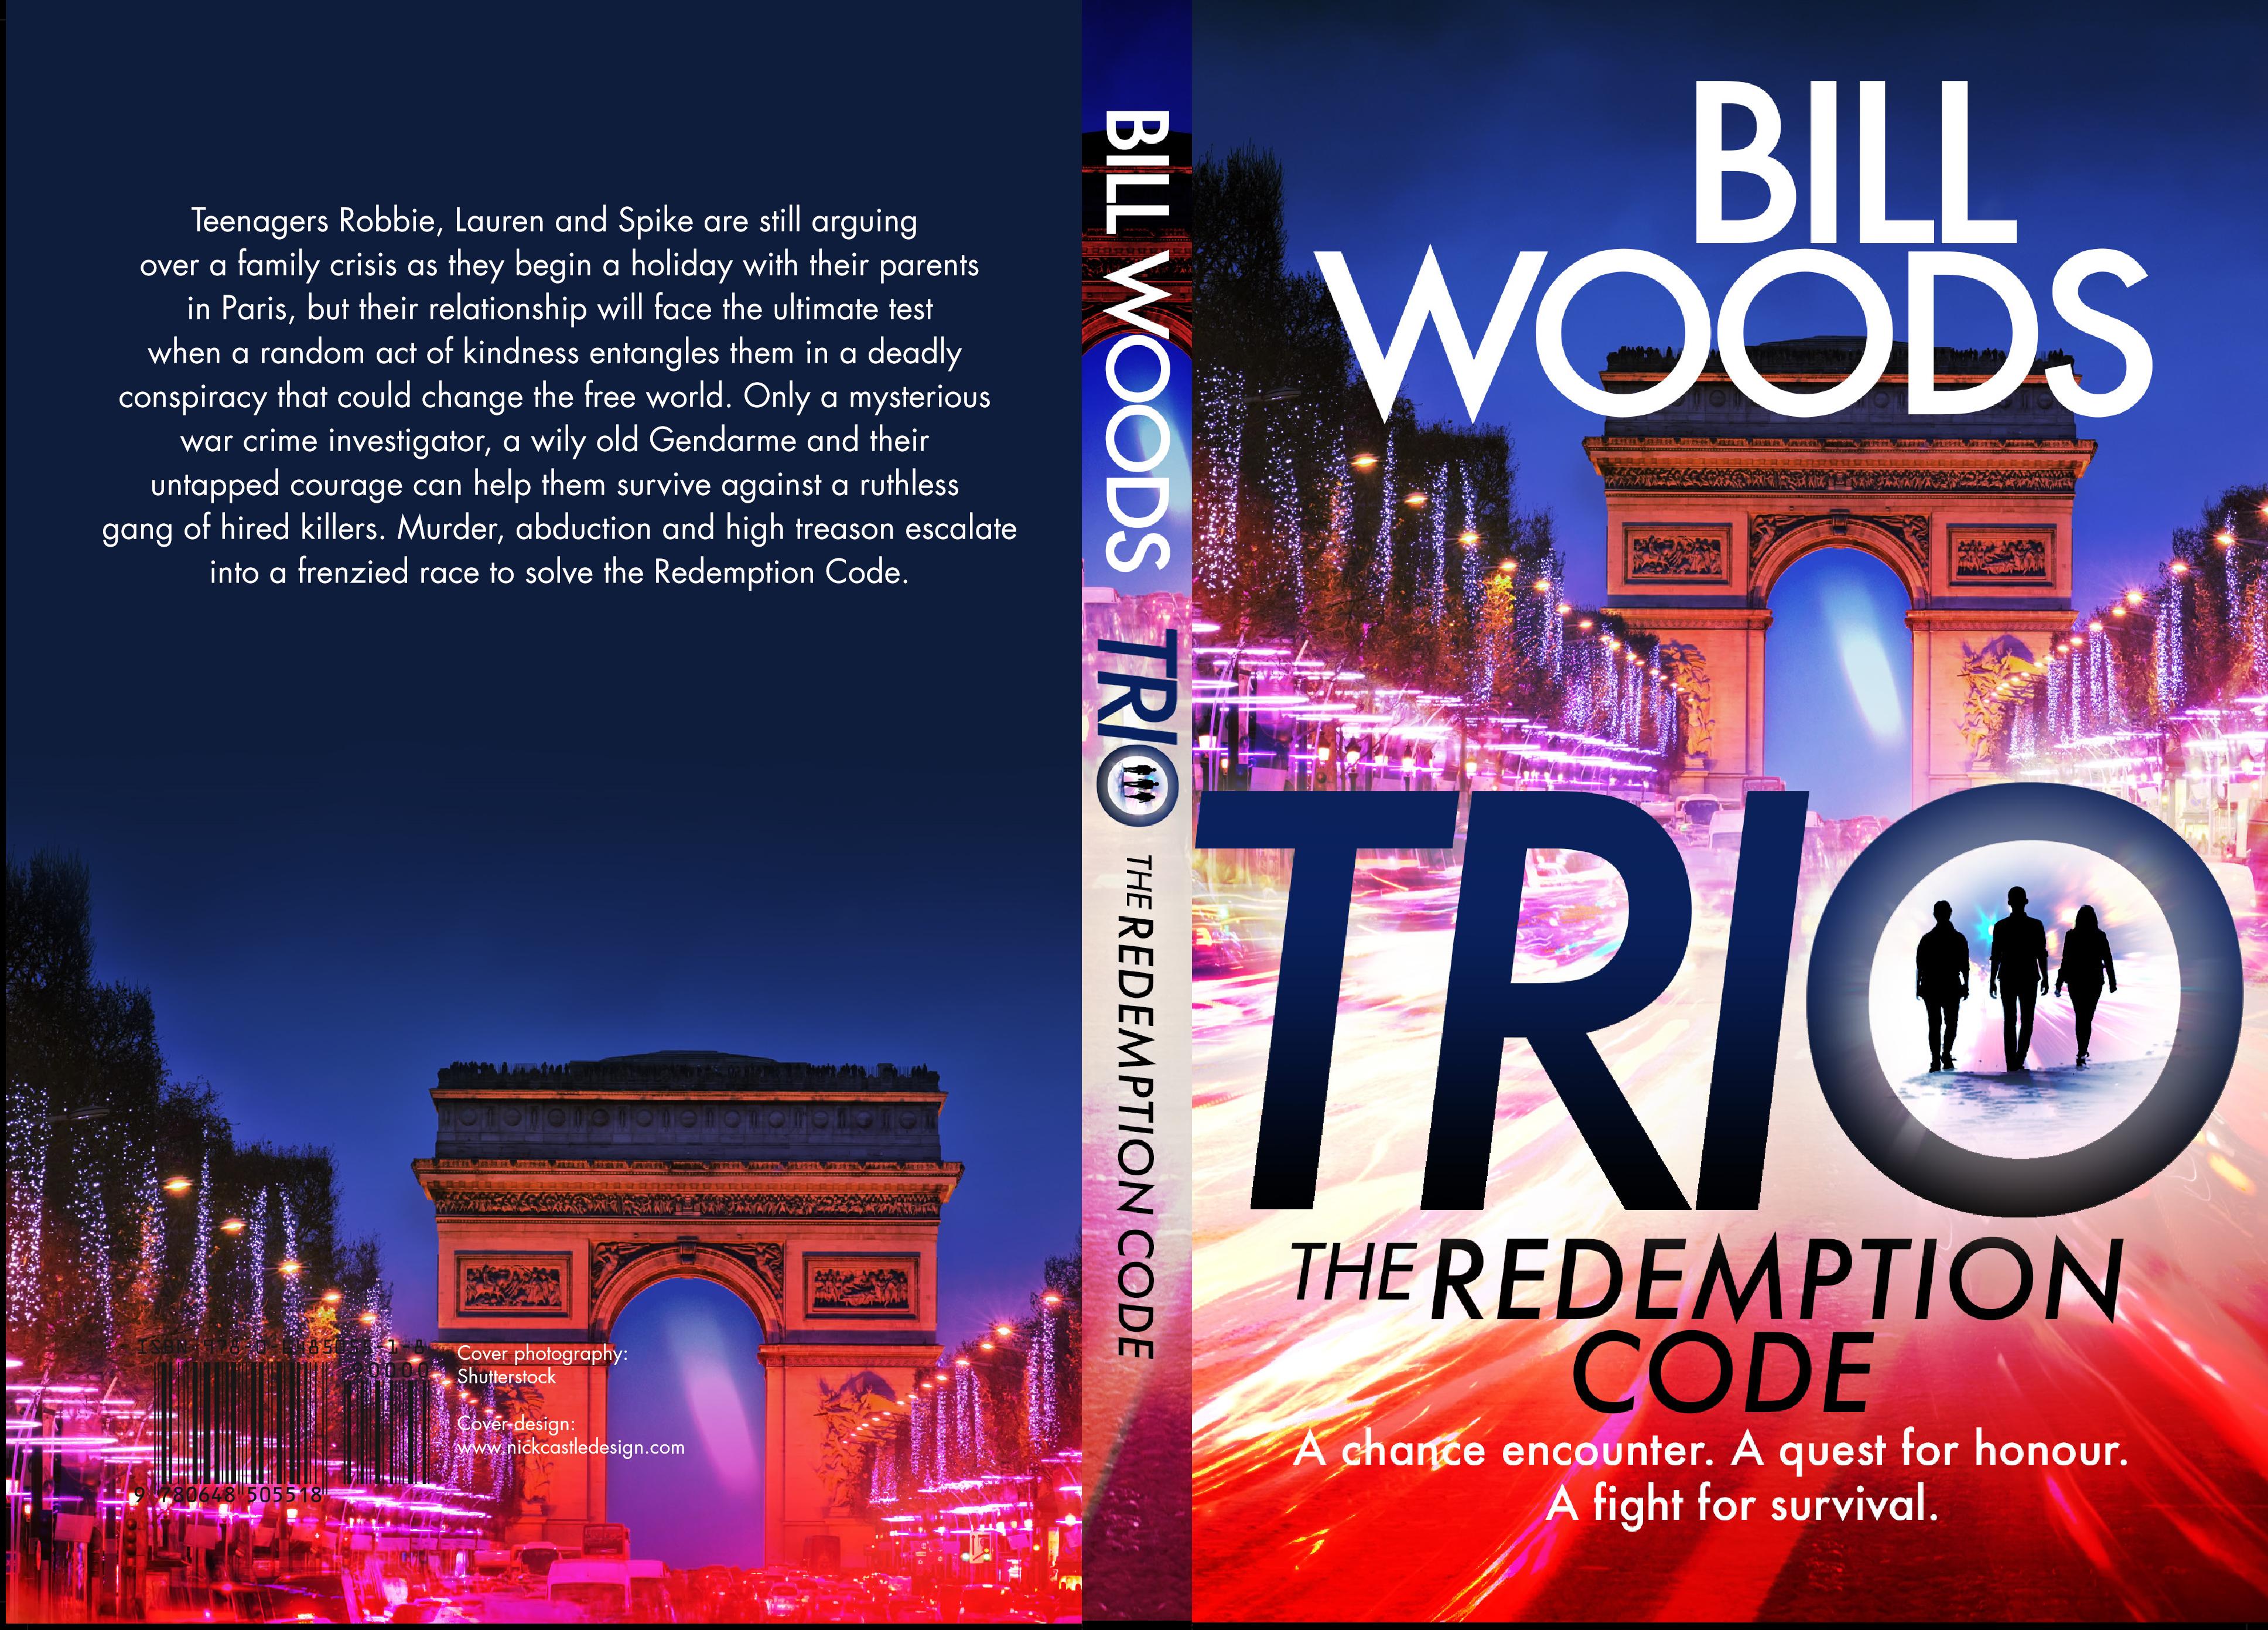 TV, Radio, Author: Renaissance man Bill Woods